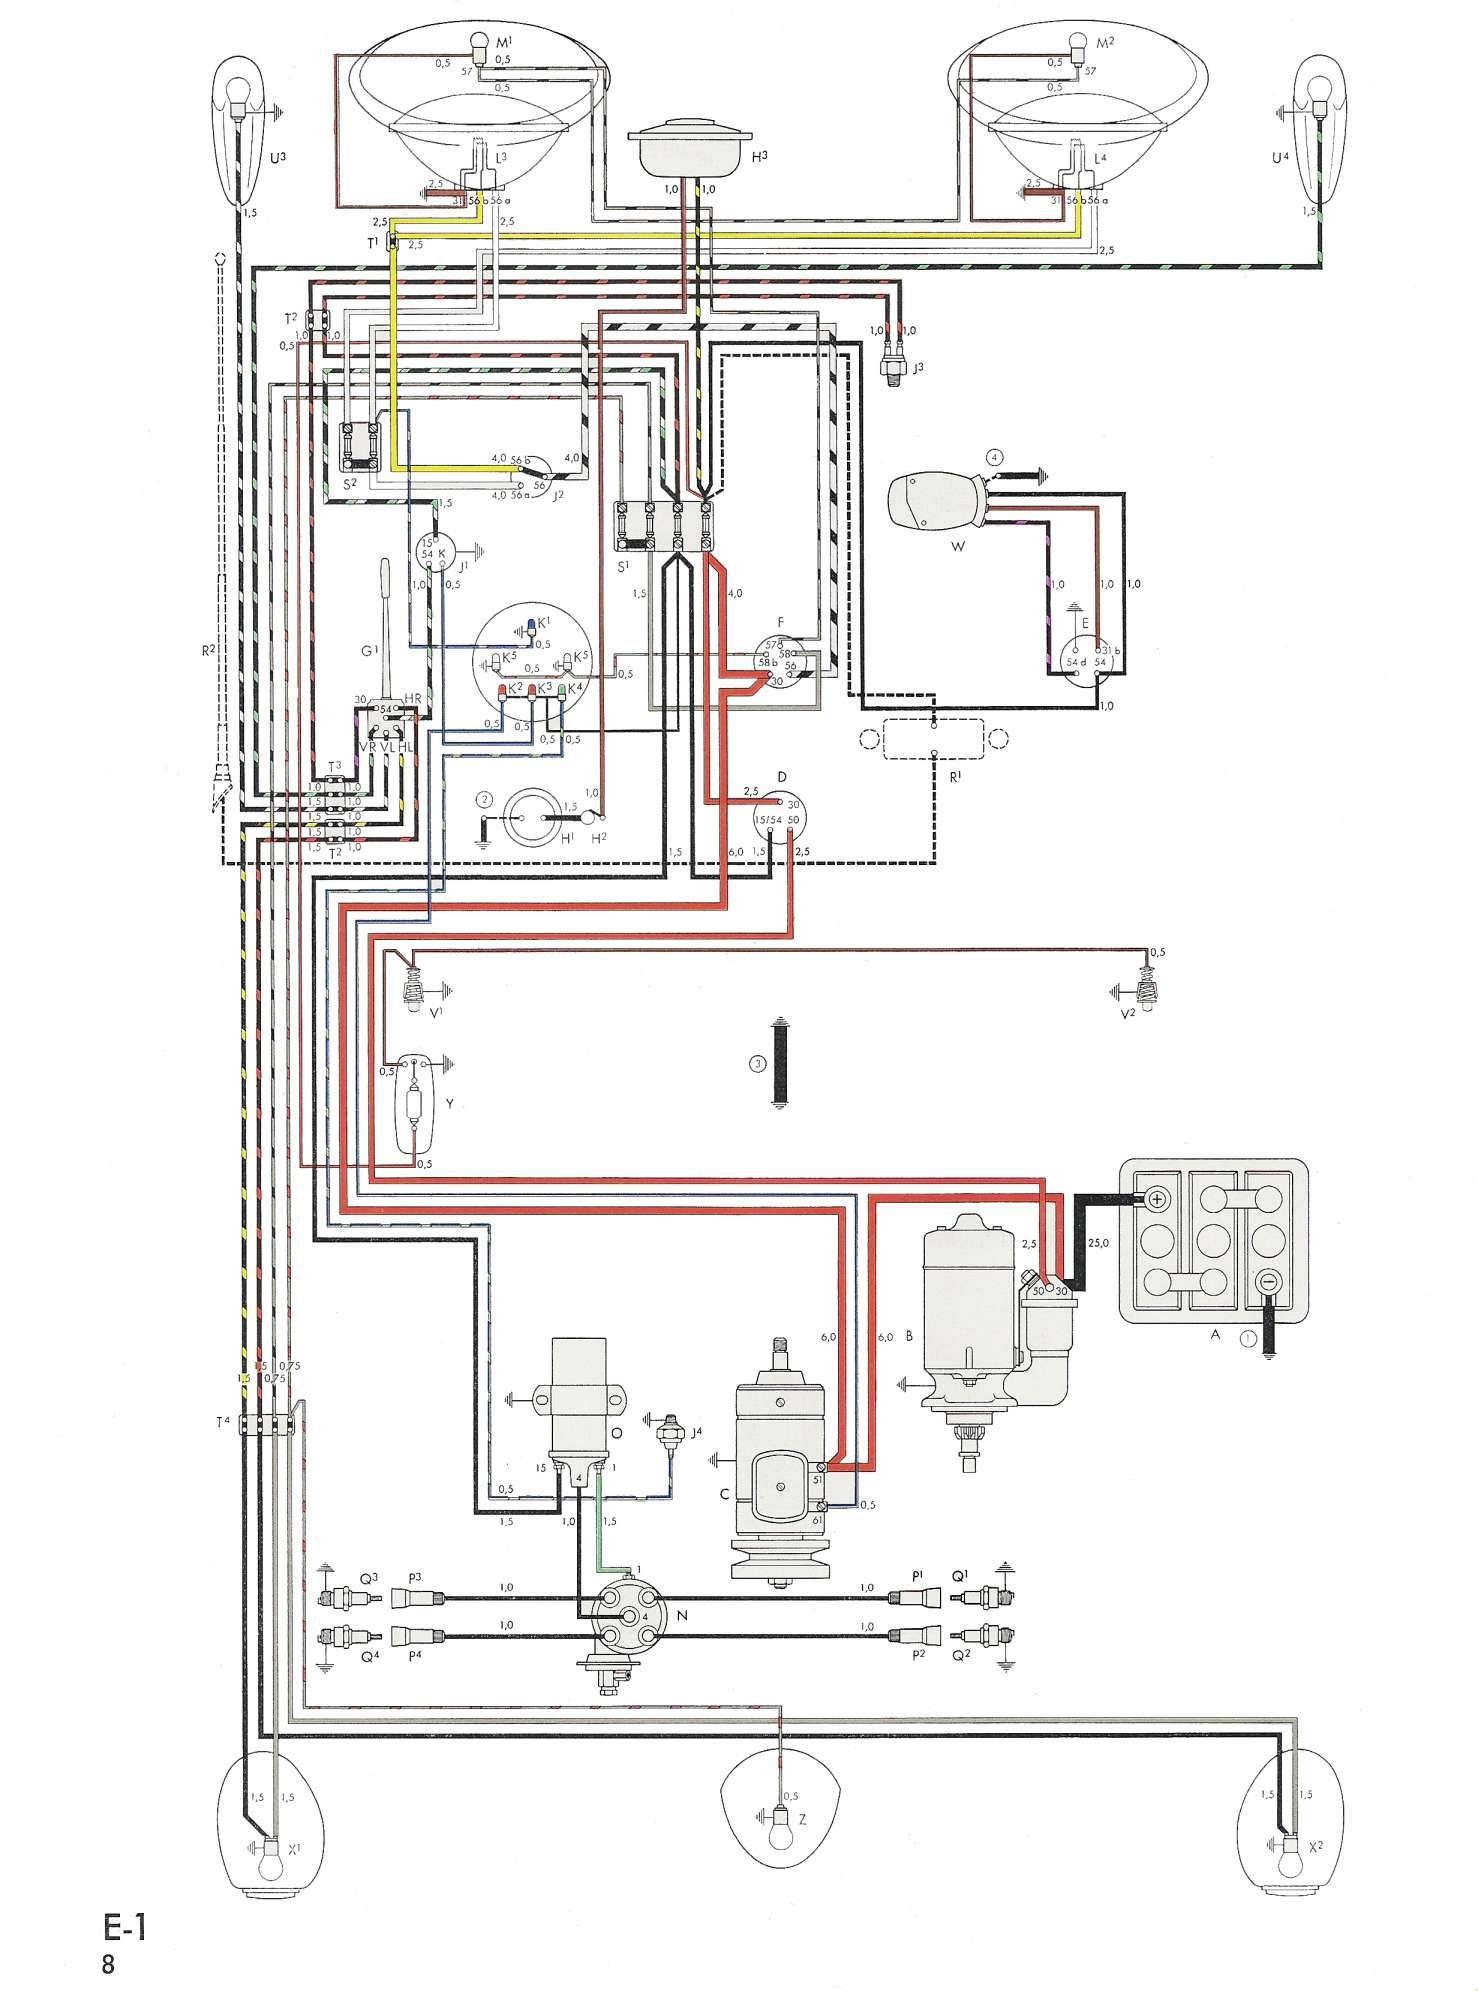 12+ Engine Wiring Diagram Vw Bug - Engine Diagram - Wiringg.net in 2020 | Vw  trike, Vw dune buggy, TrikePinterest